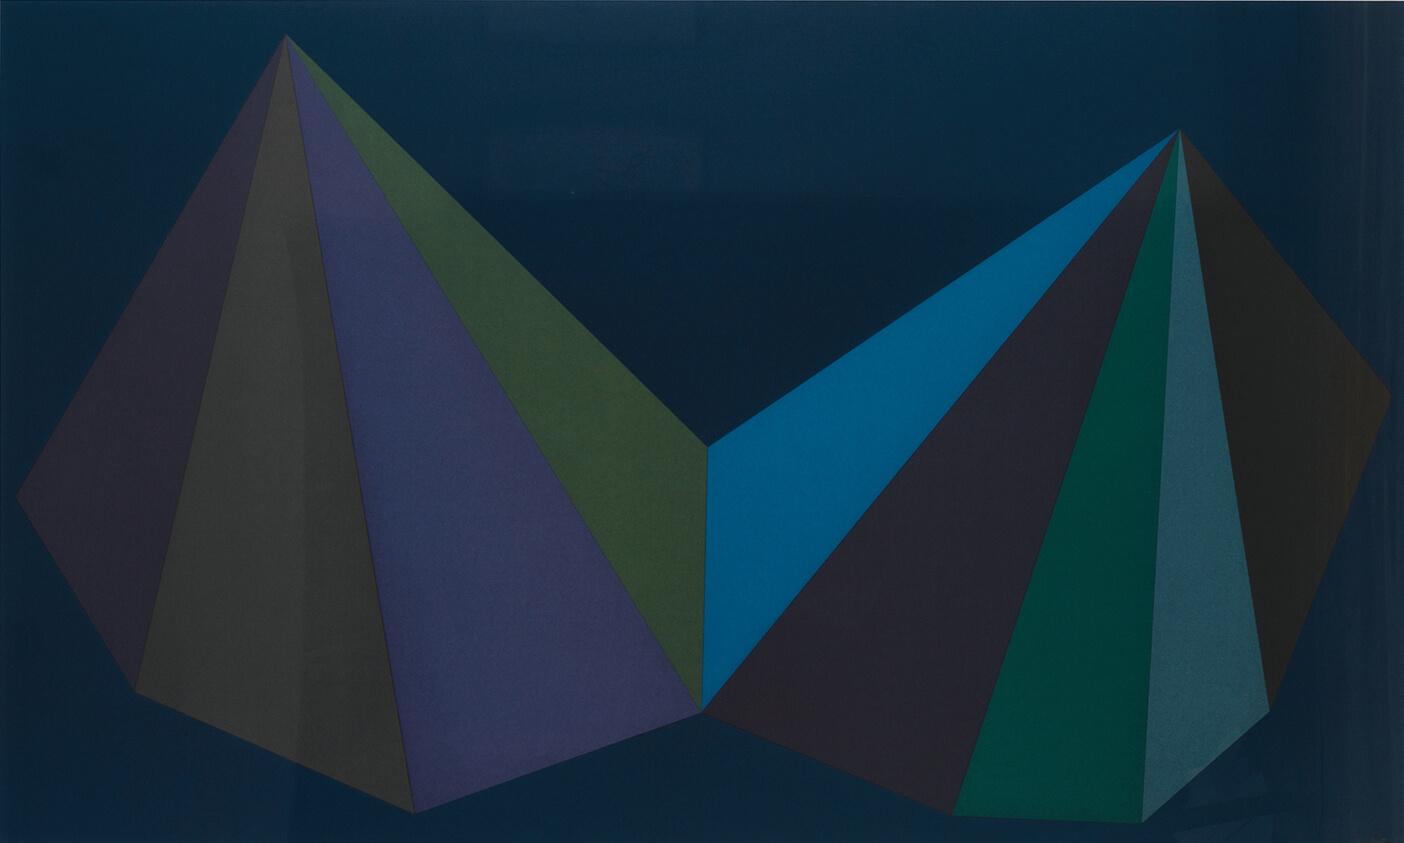 Two Asymmetrical Pyramids: Plate 3